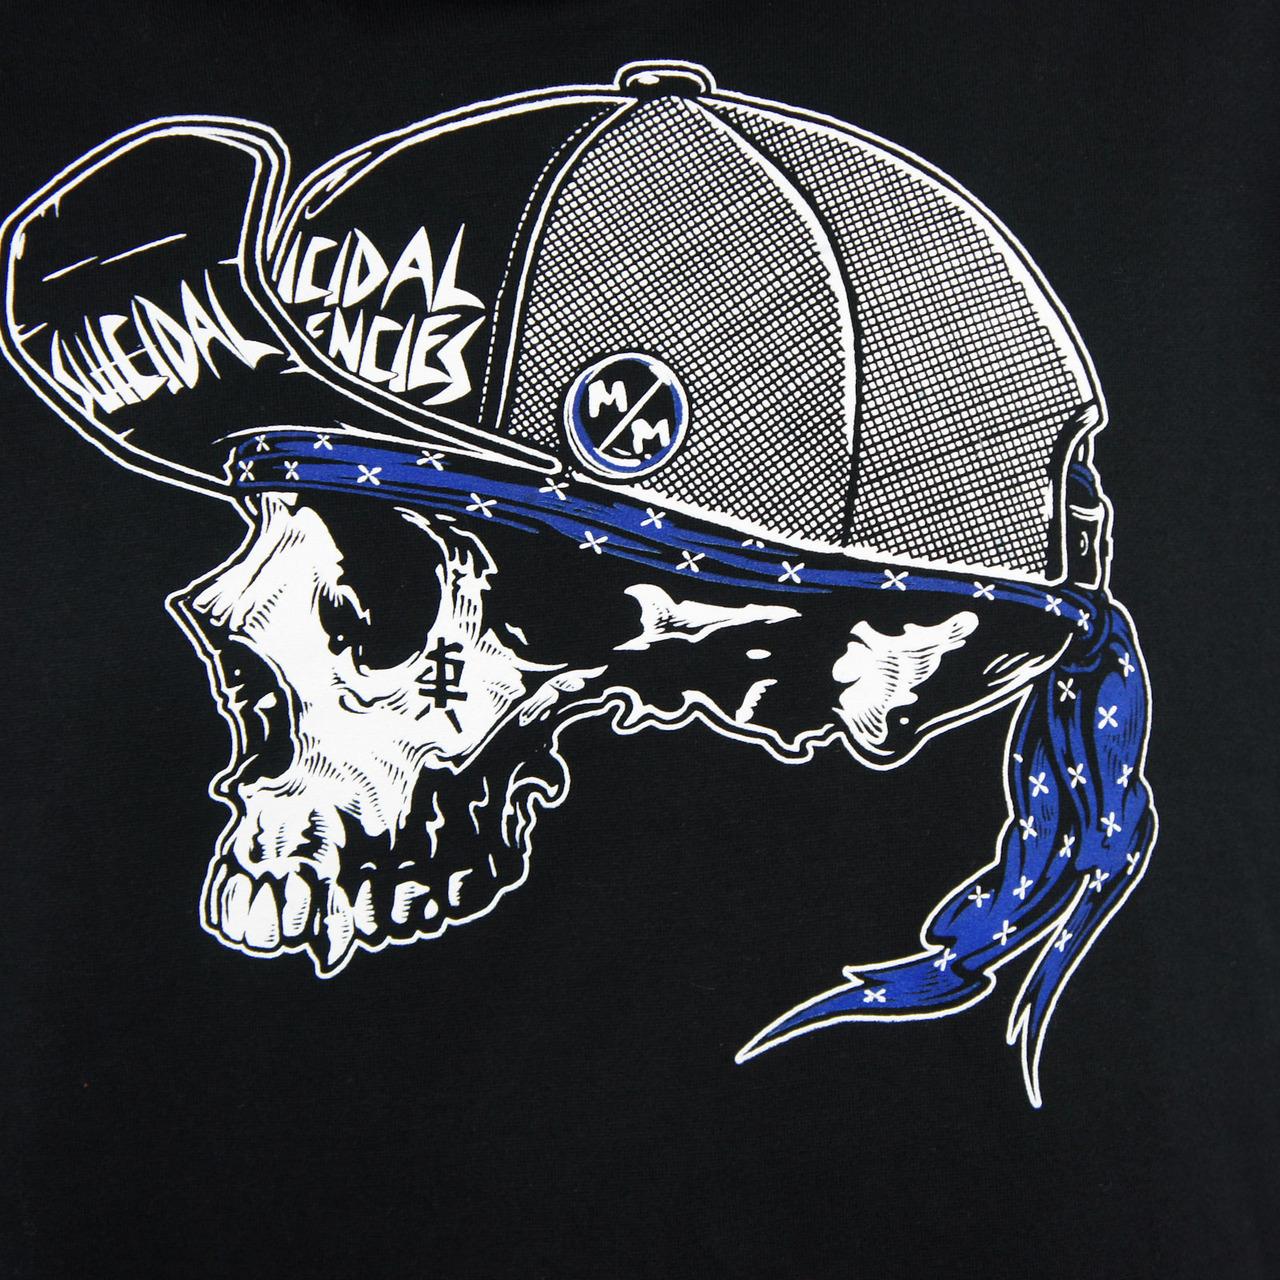 Metal Mulisha Shirts | Get Rockin\' Apparel Online for Less